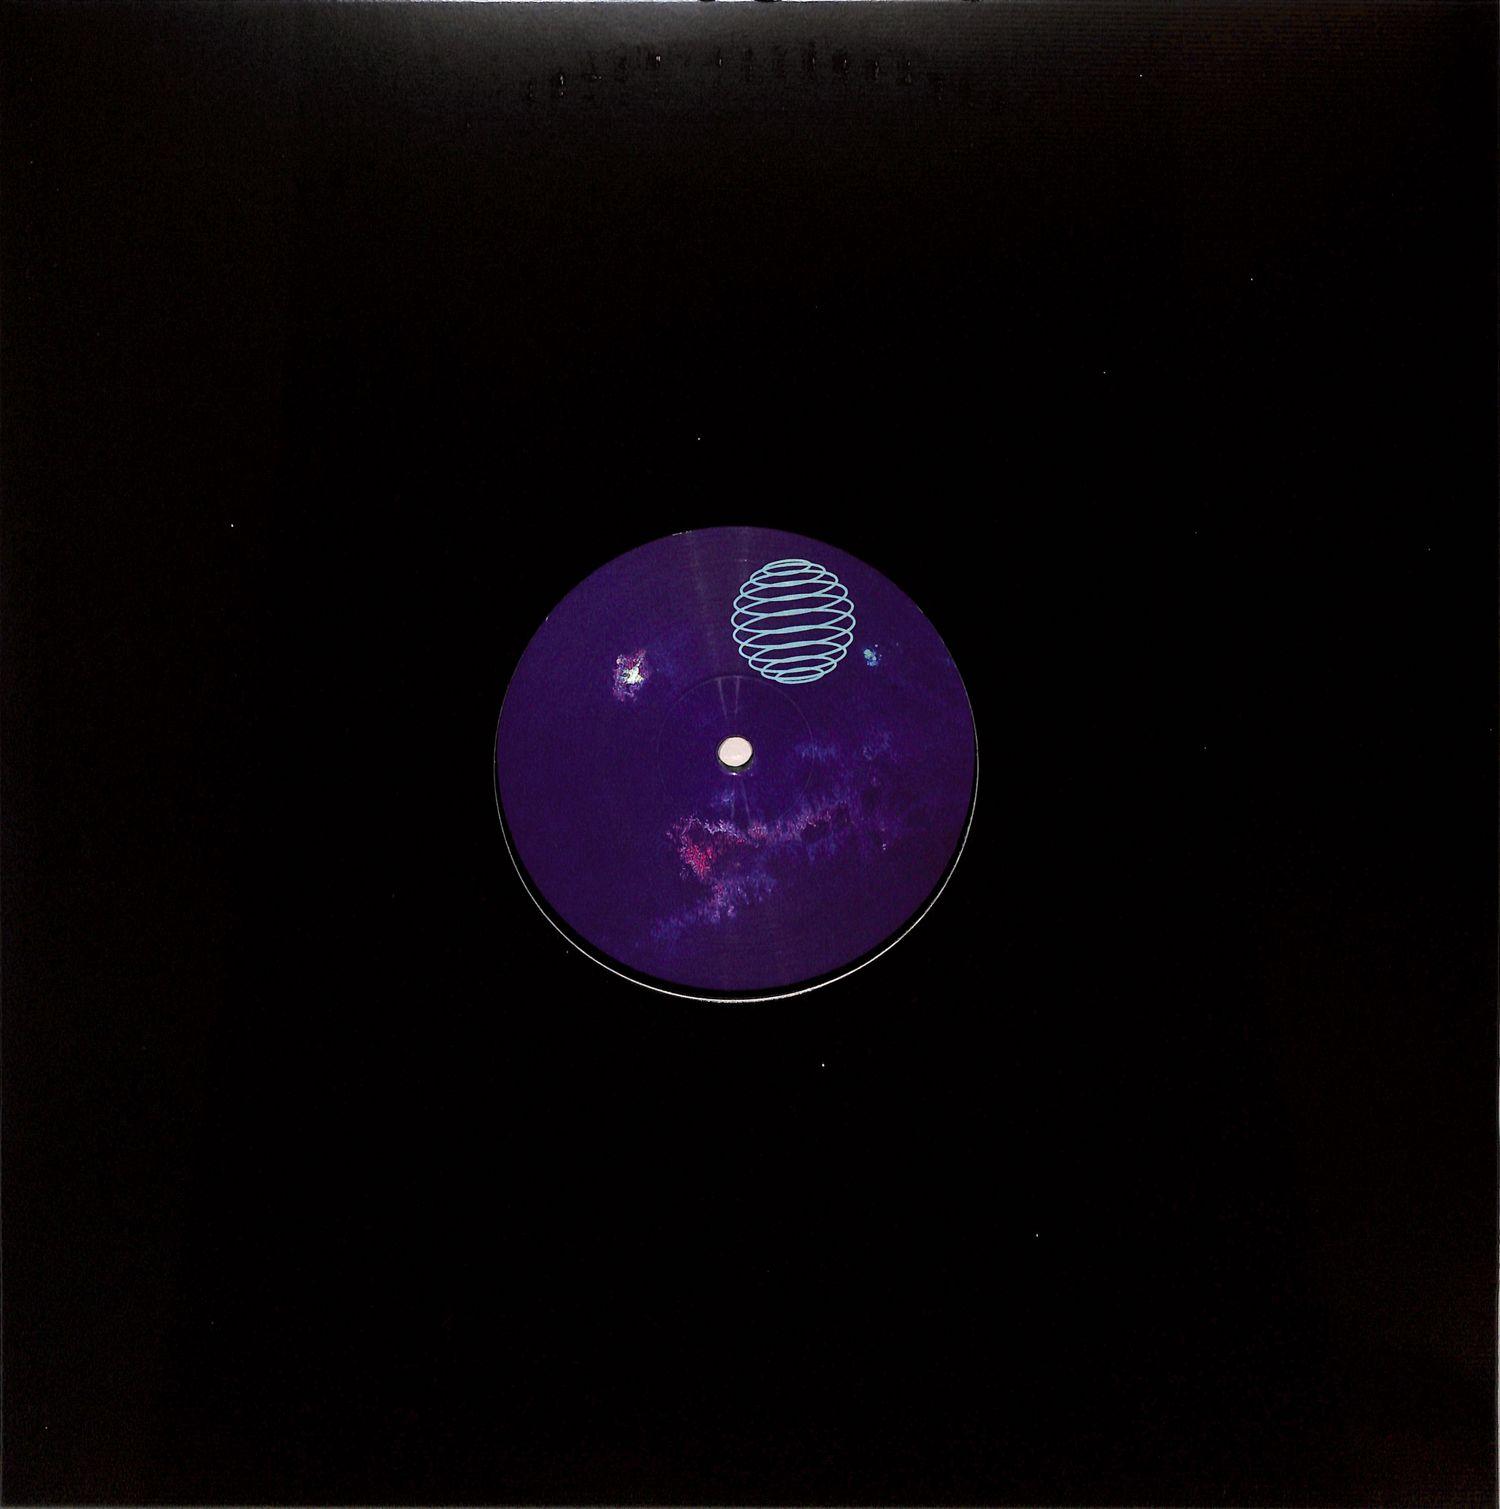 Mohia / JL. - KERNEL RHYTHMS EP